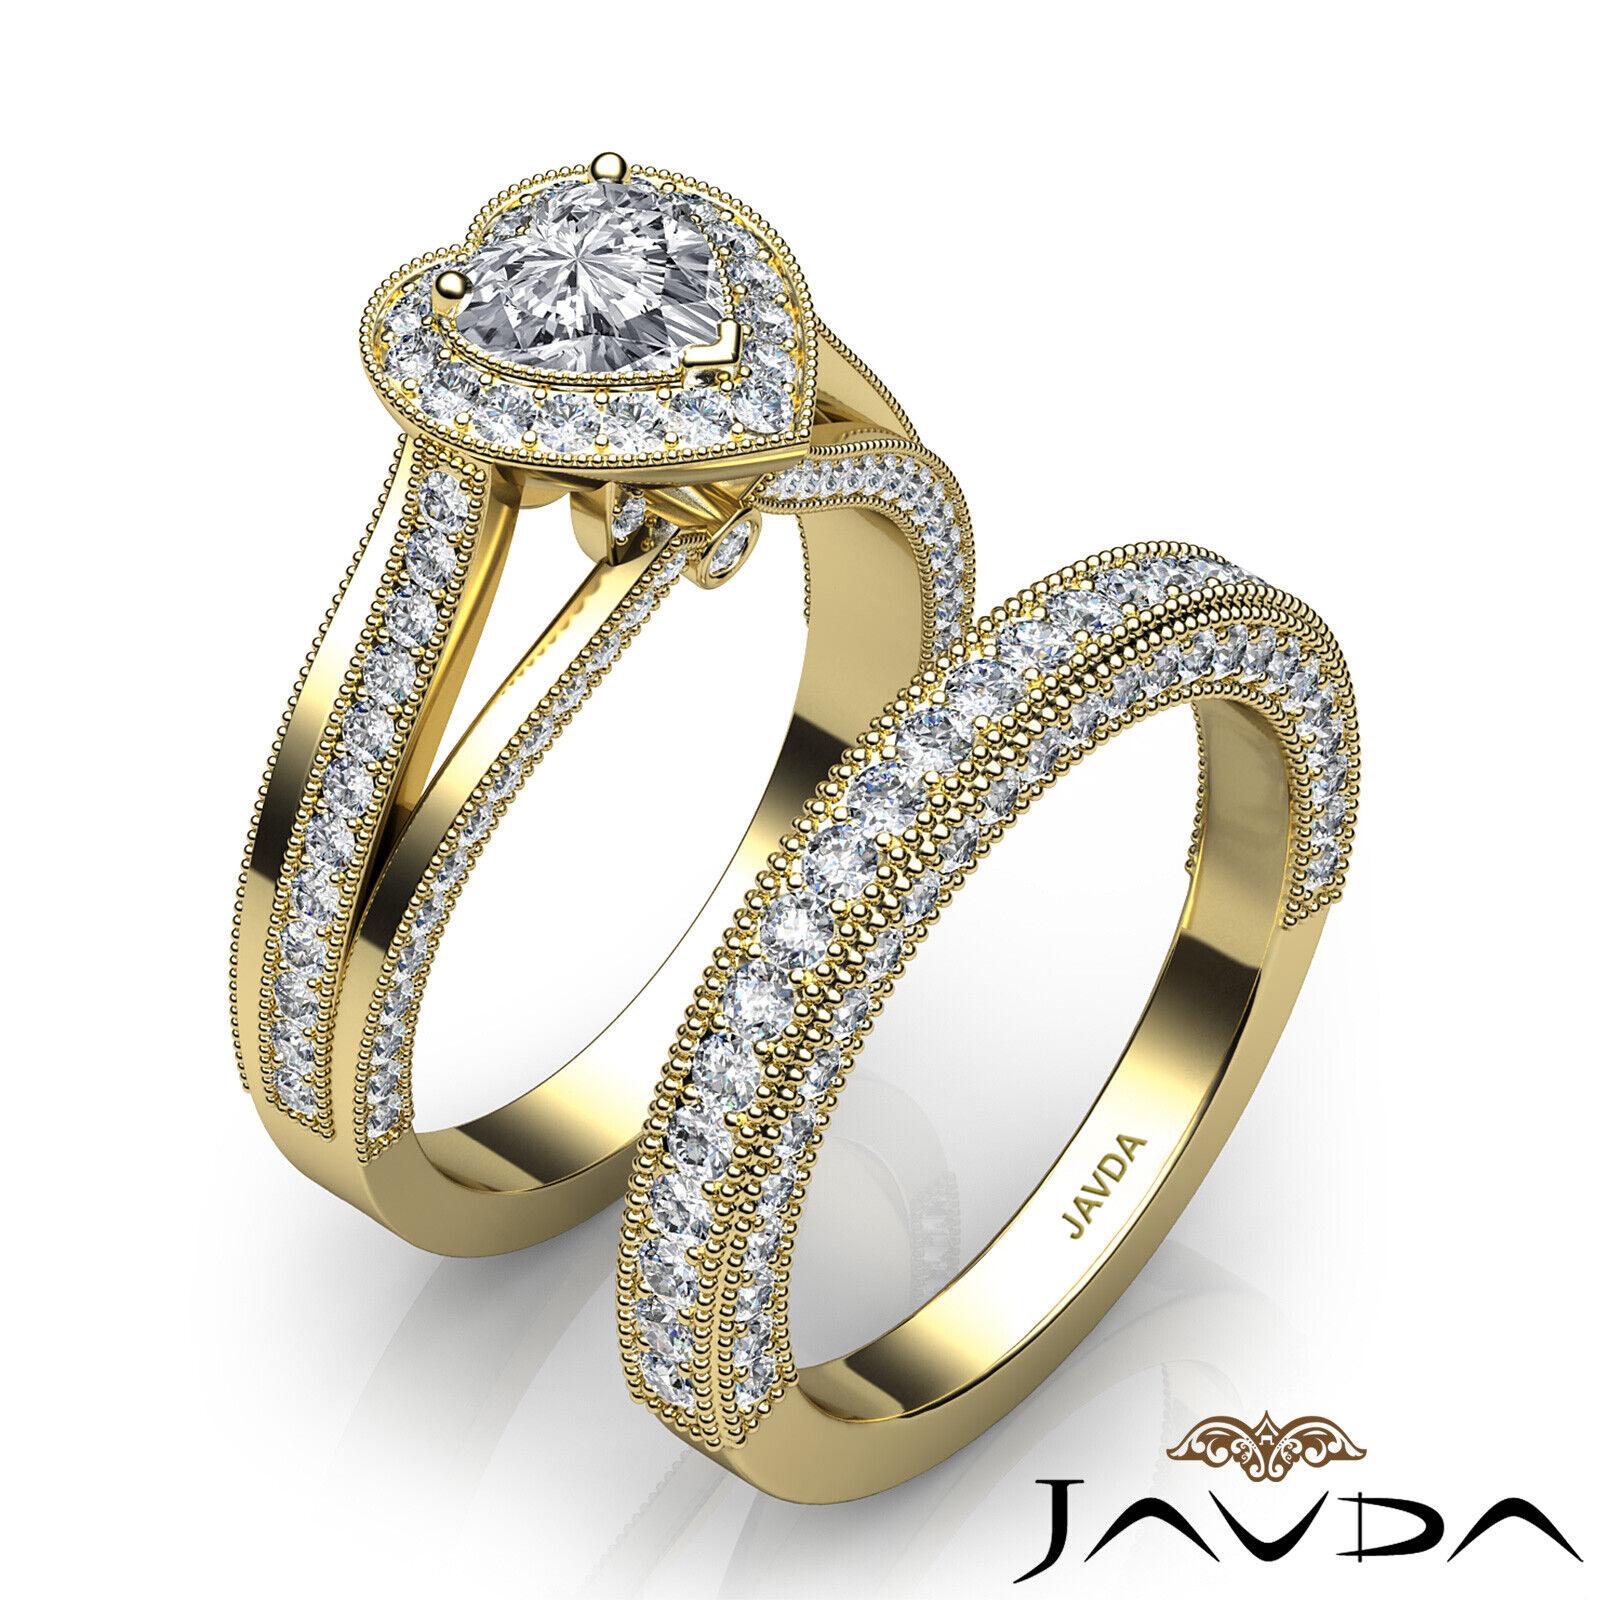 2.24ctw Halo Milgrain Edge Bridal Heart Diamond Engagement Ring GIA F-VS1  Gold 9